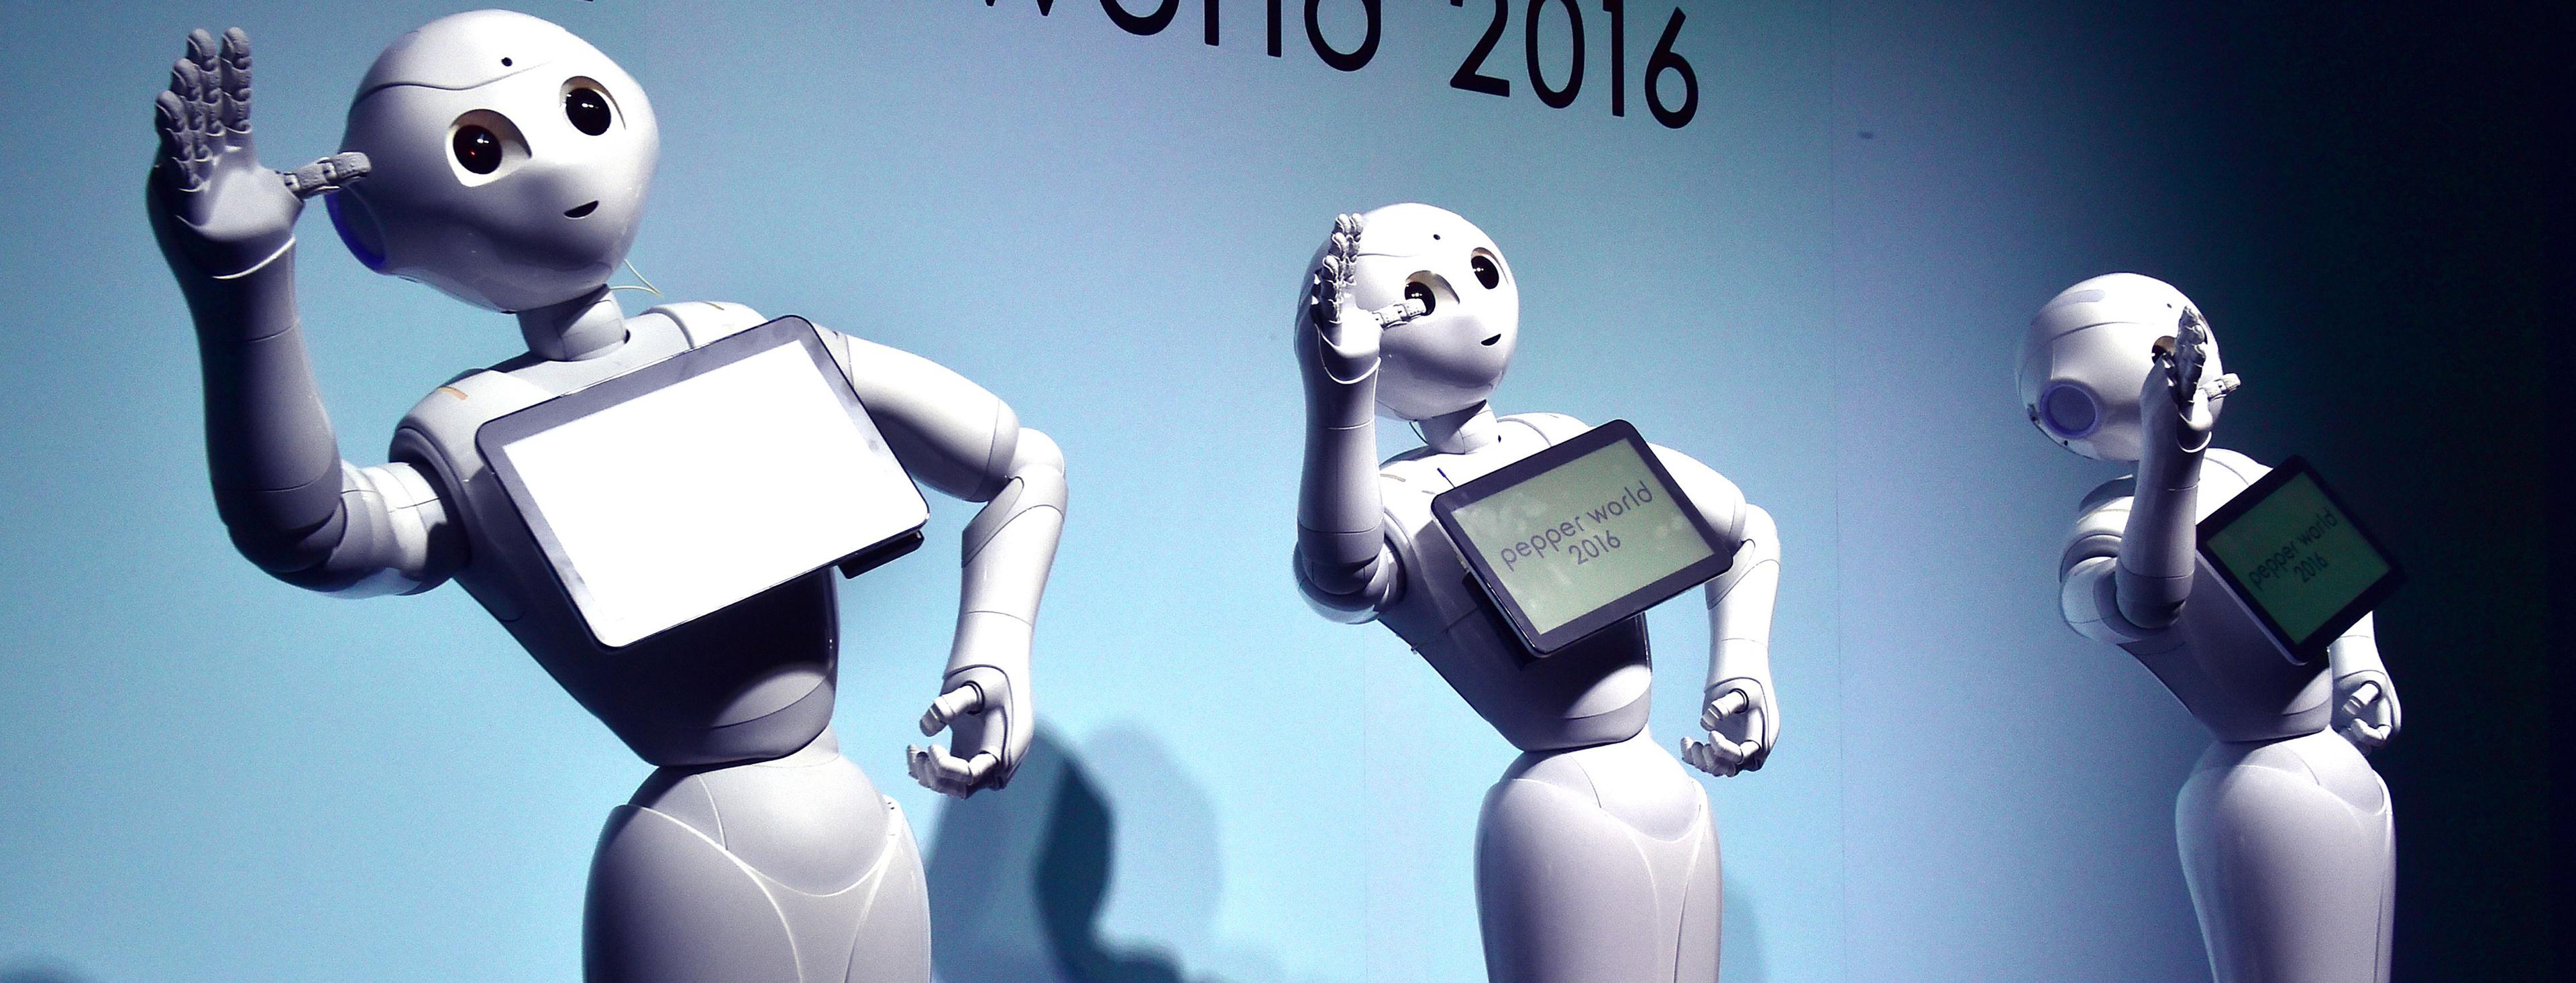 JAPAN-SOFTBANK-ROBOT-LIFESTYLE-MANUFACTURING